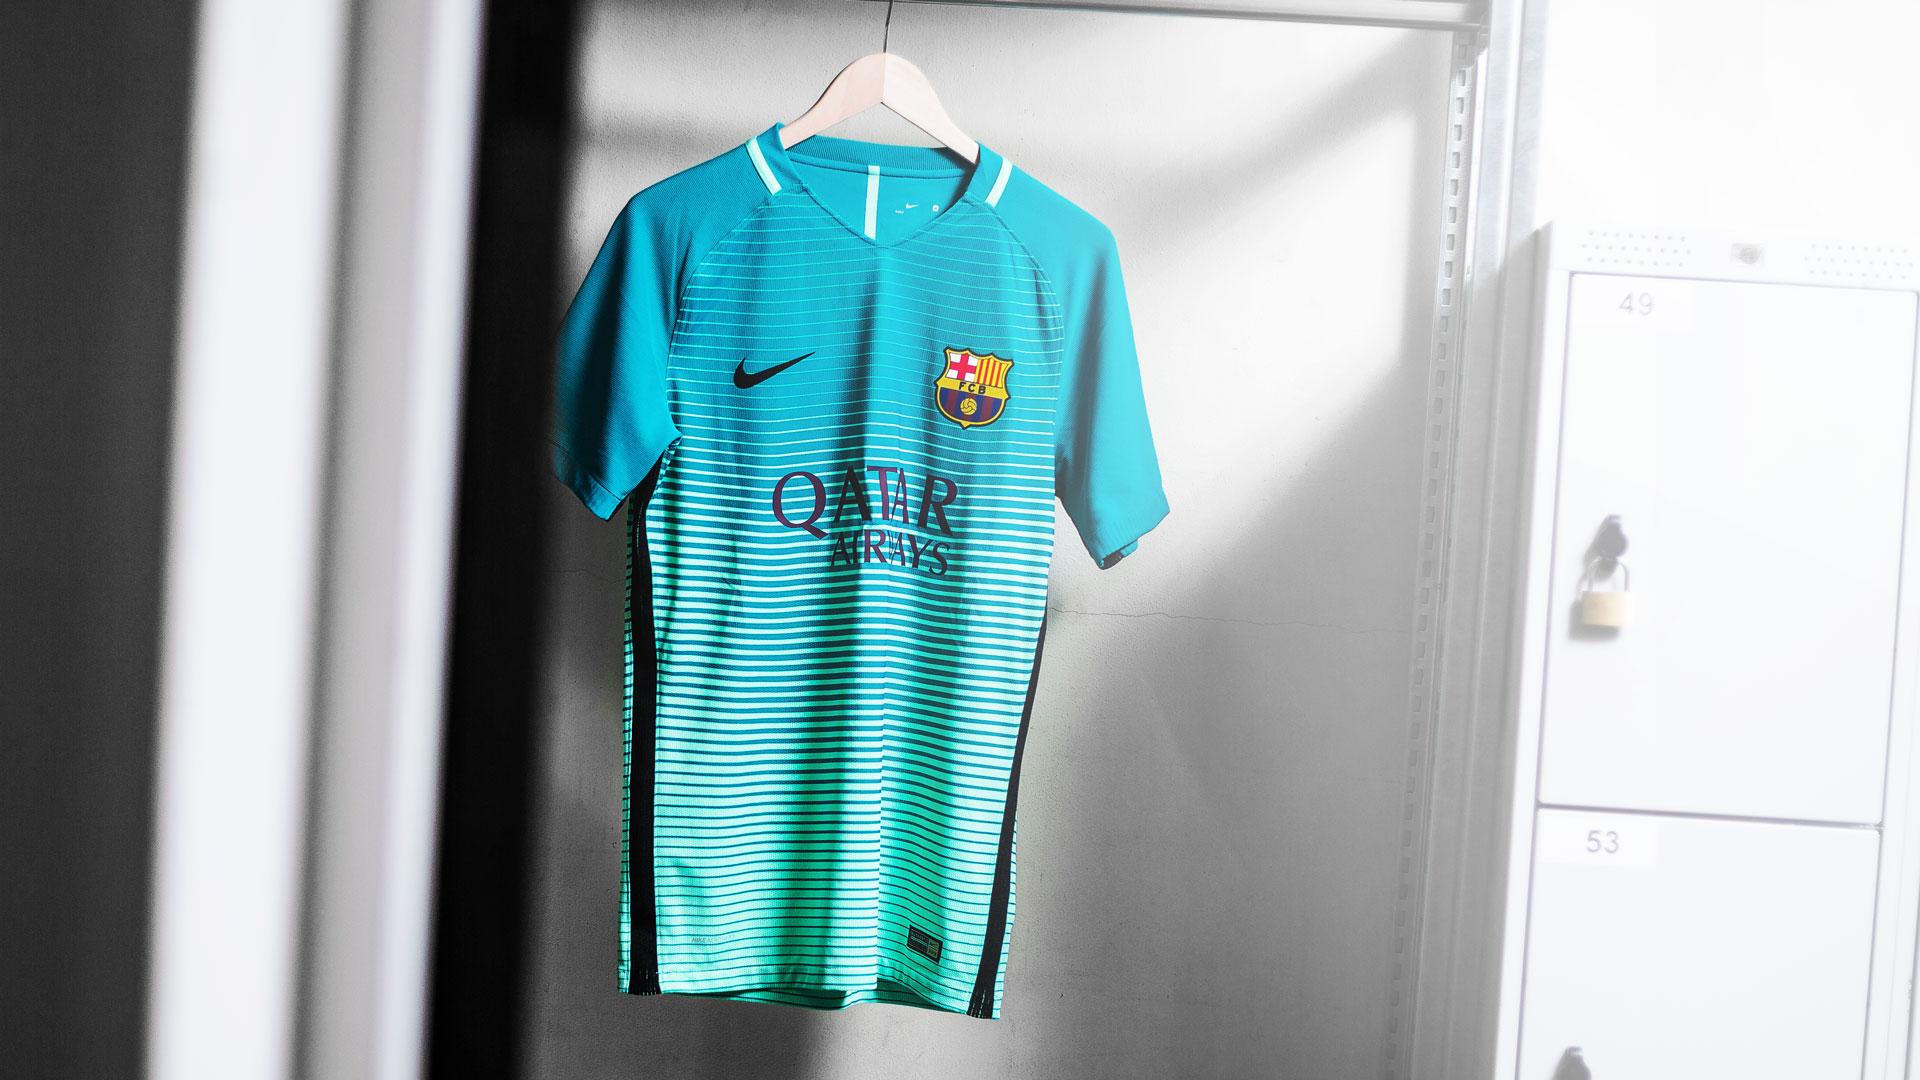 fc barcelona 3rd shirt finally released fc barcelona 3rd shirt finally released